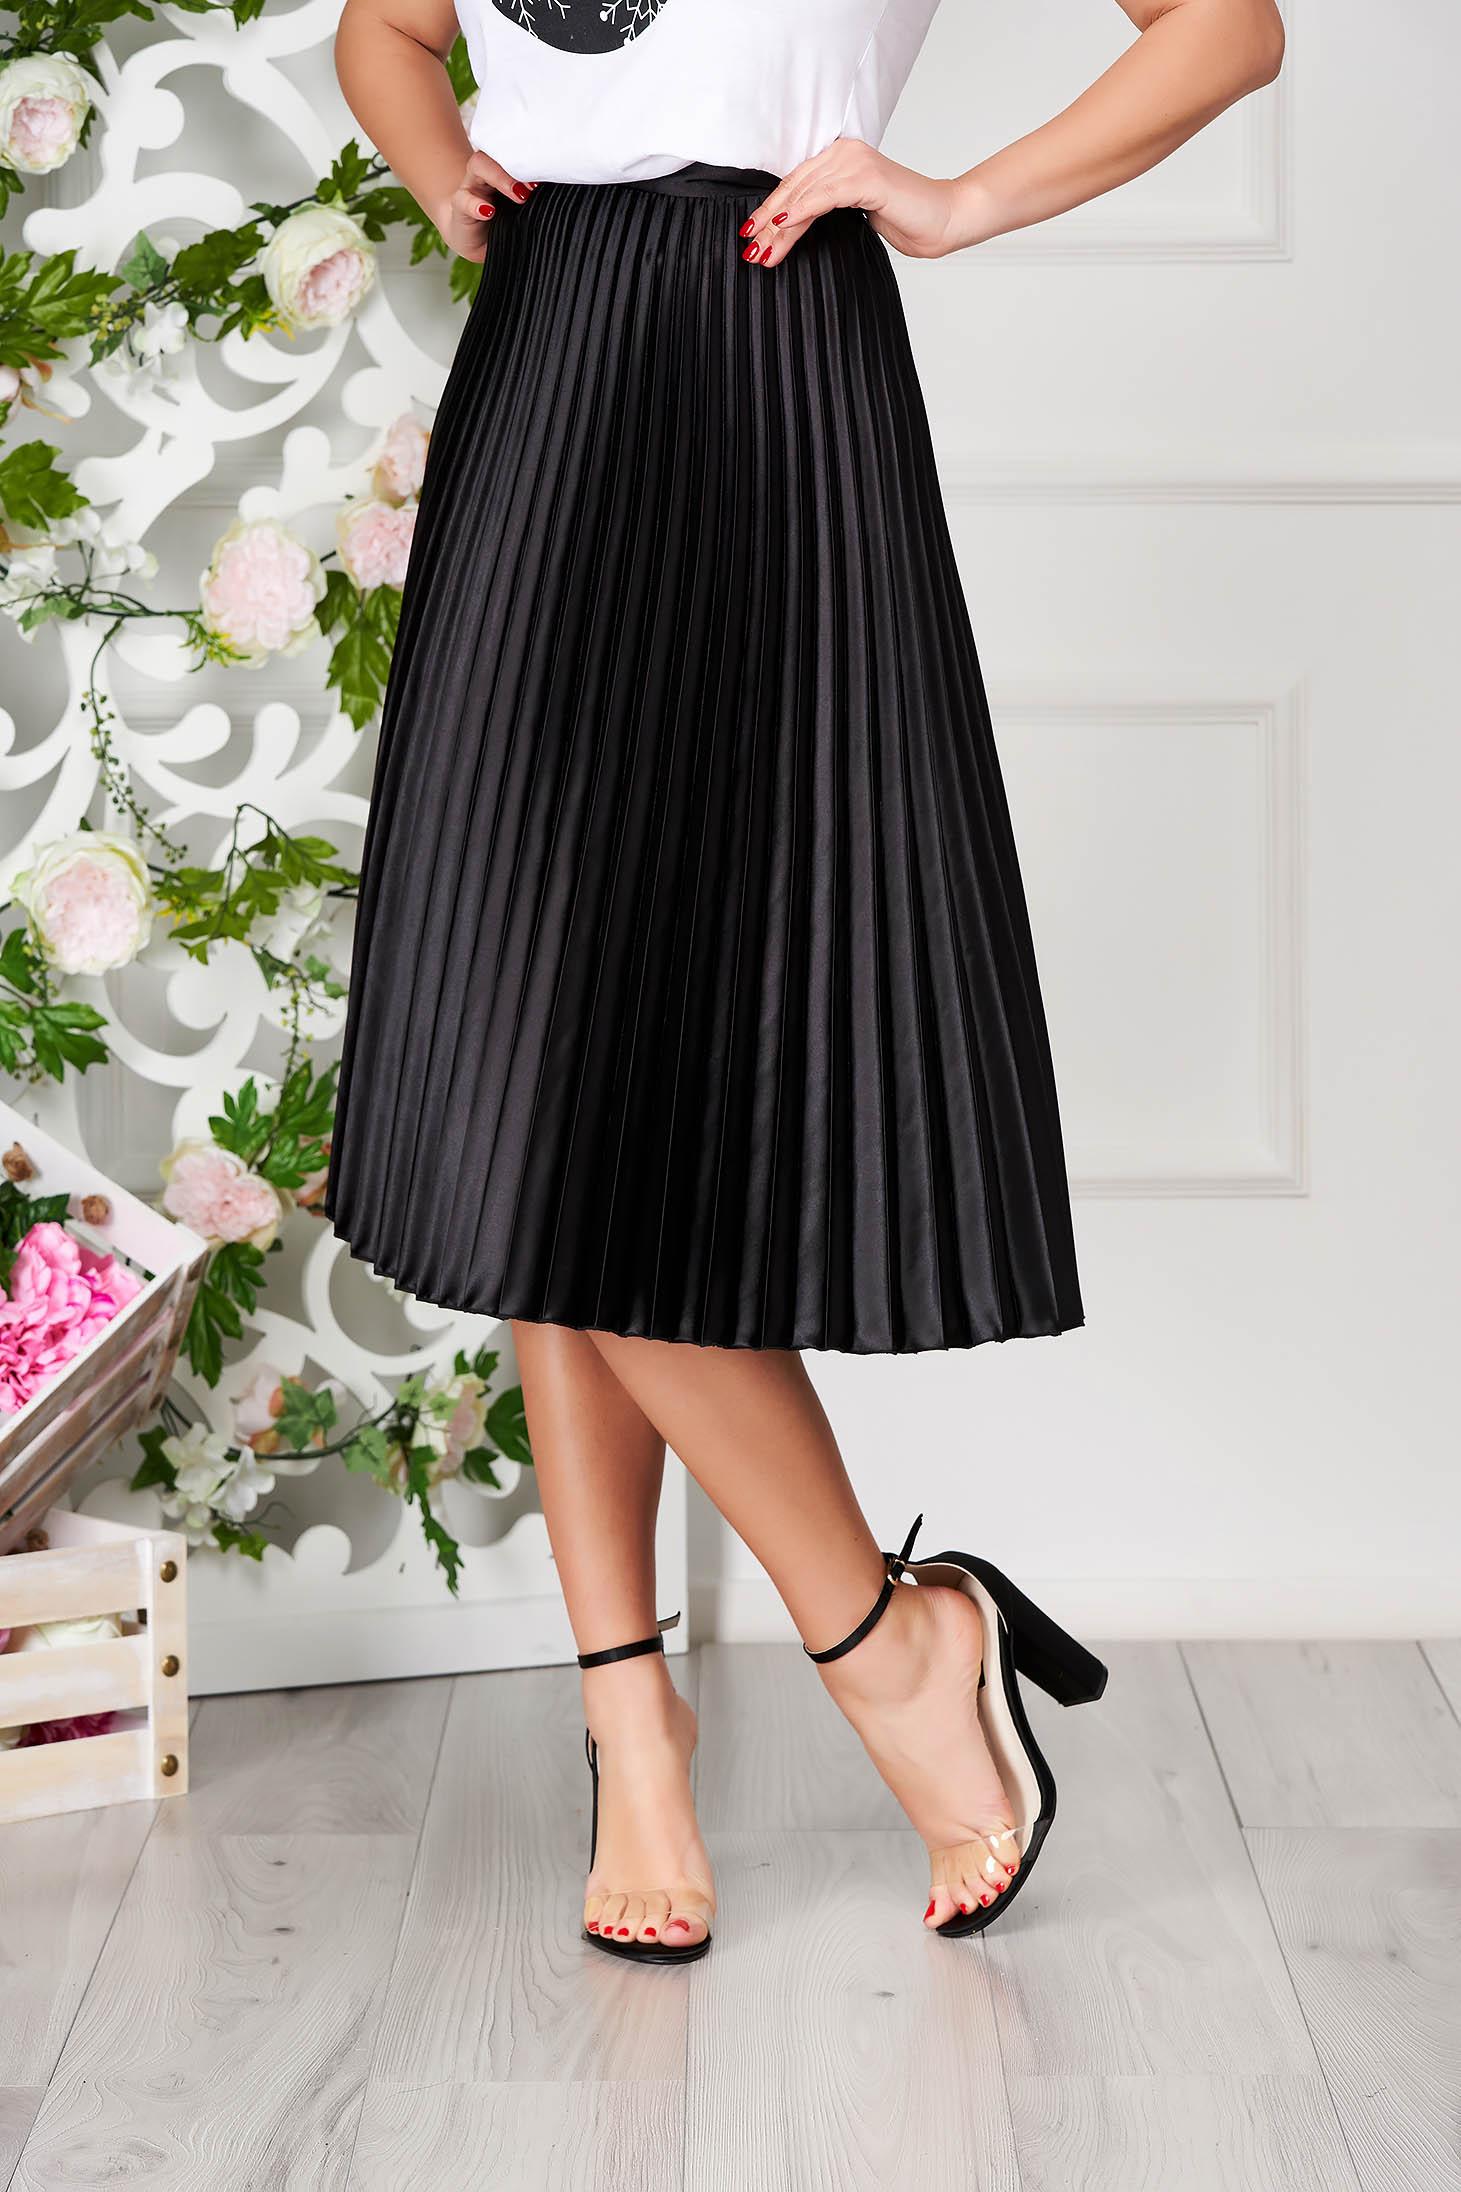 StarShinerS black skirt elegant cloche midi from satin folded up